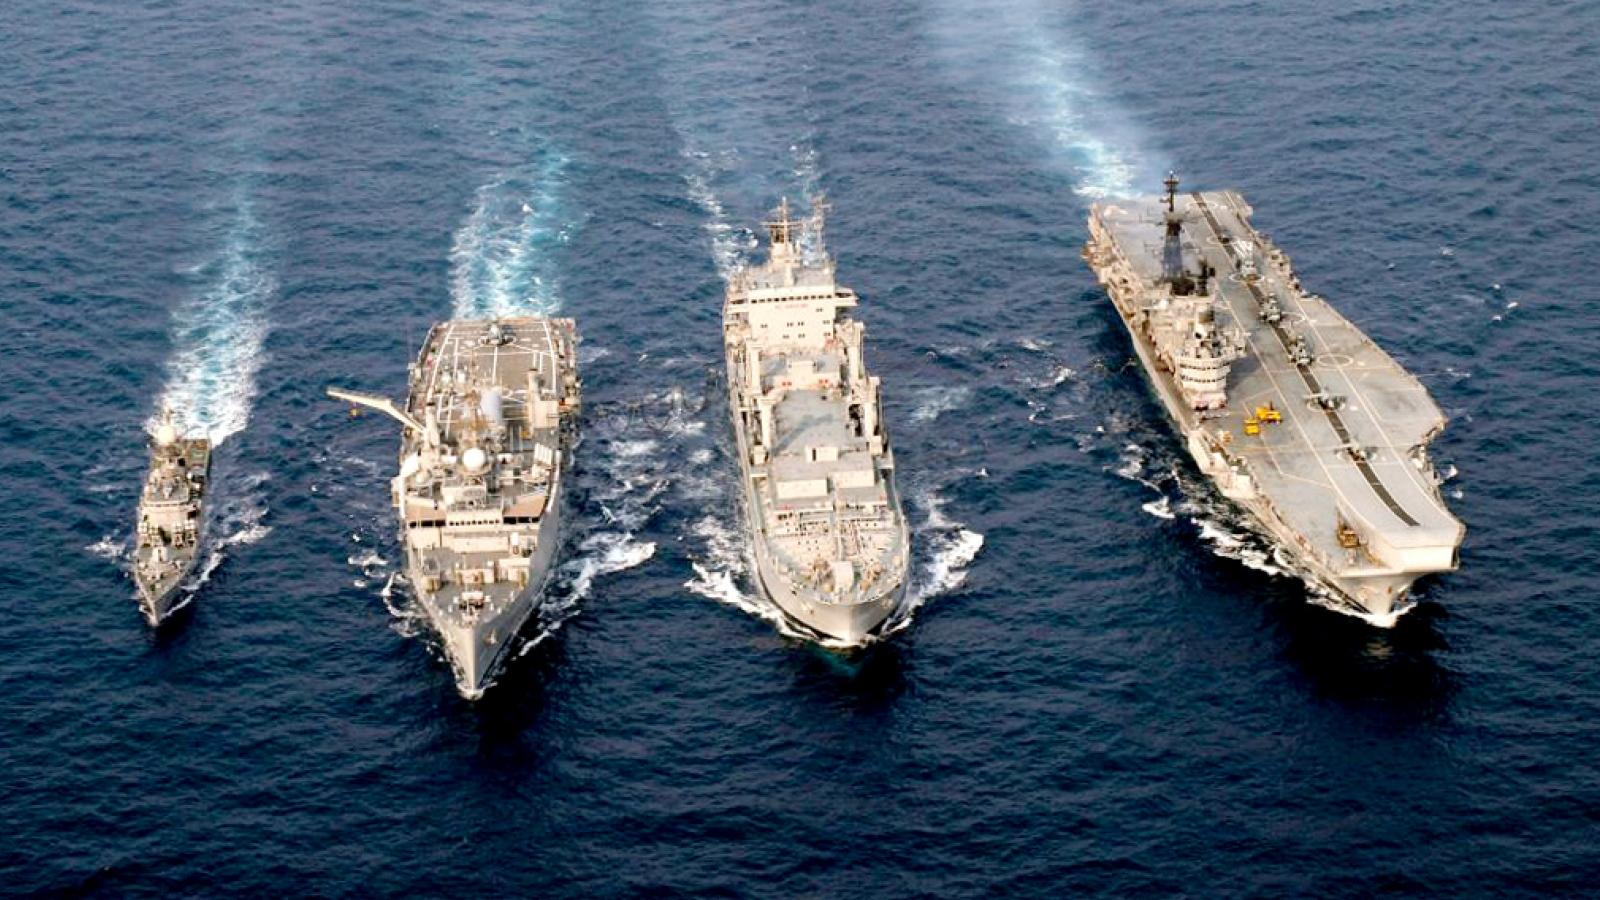 Ấn Độ tính mời Australia dự tập trận hải quân